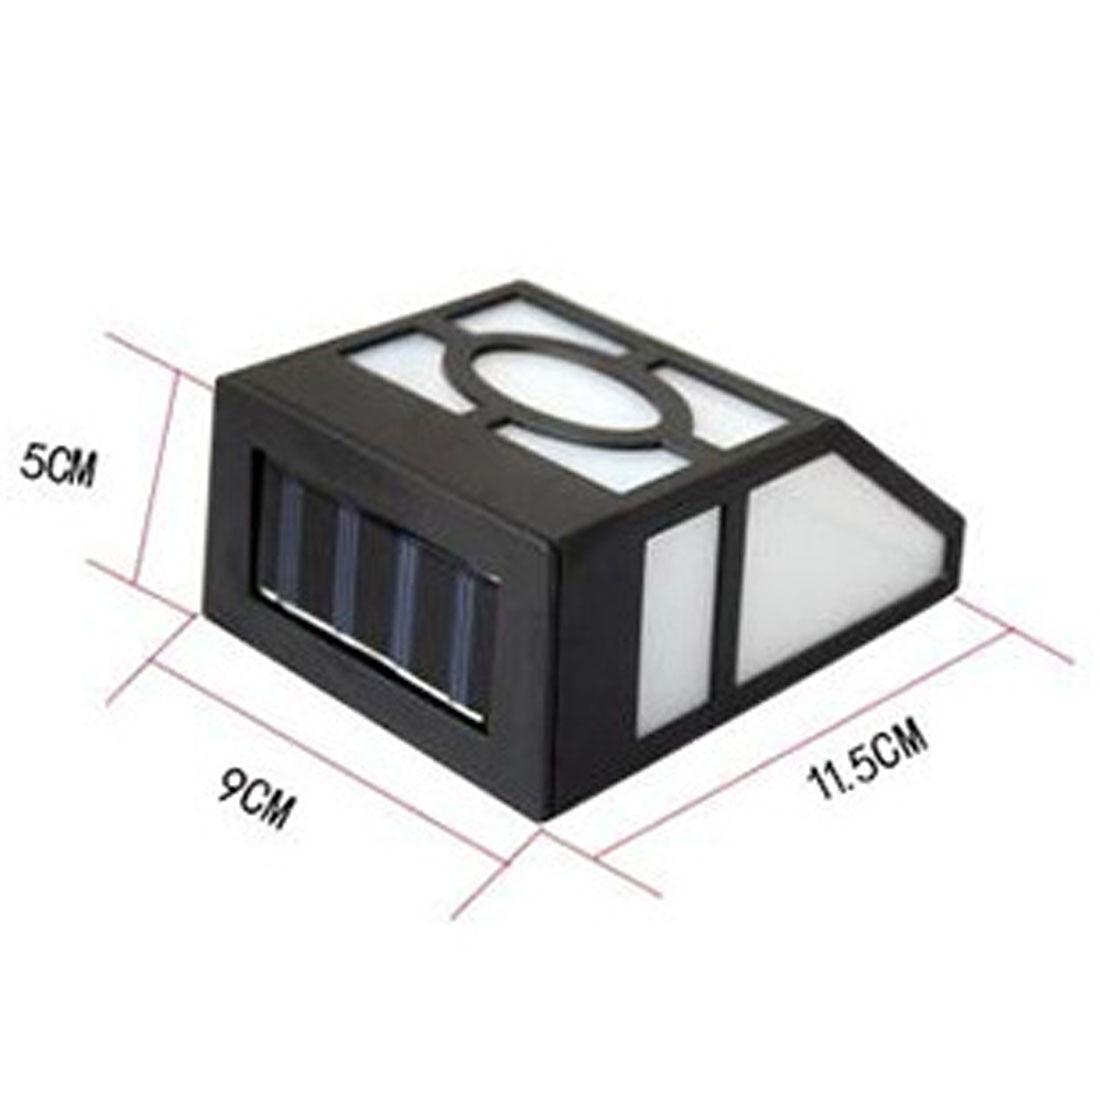 Waterproof Mounted Solar LED Panel Lamp Sensor Outdoor Fence Wall Lamp Lighting LED Garden Light